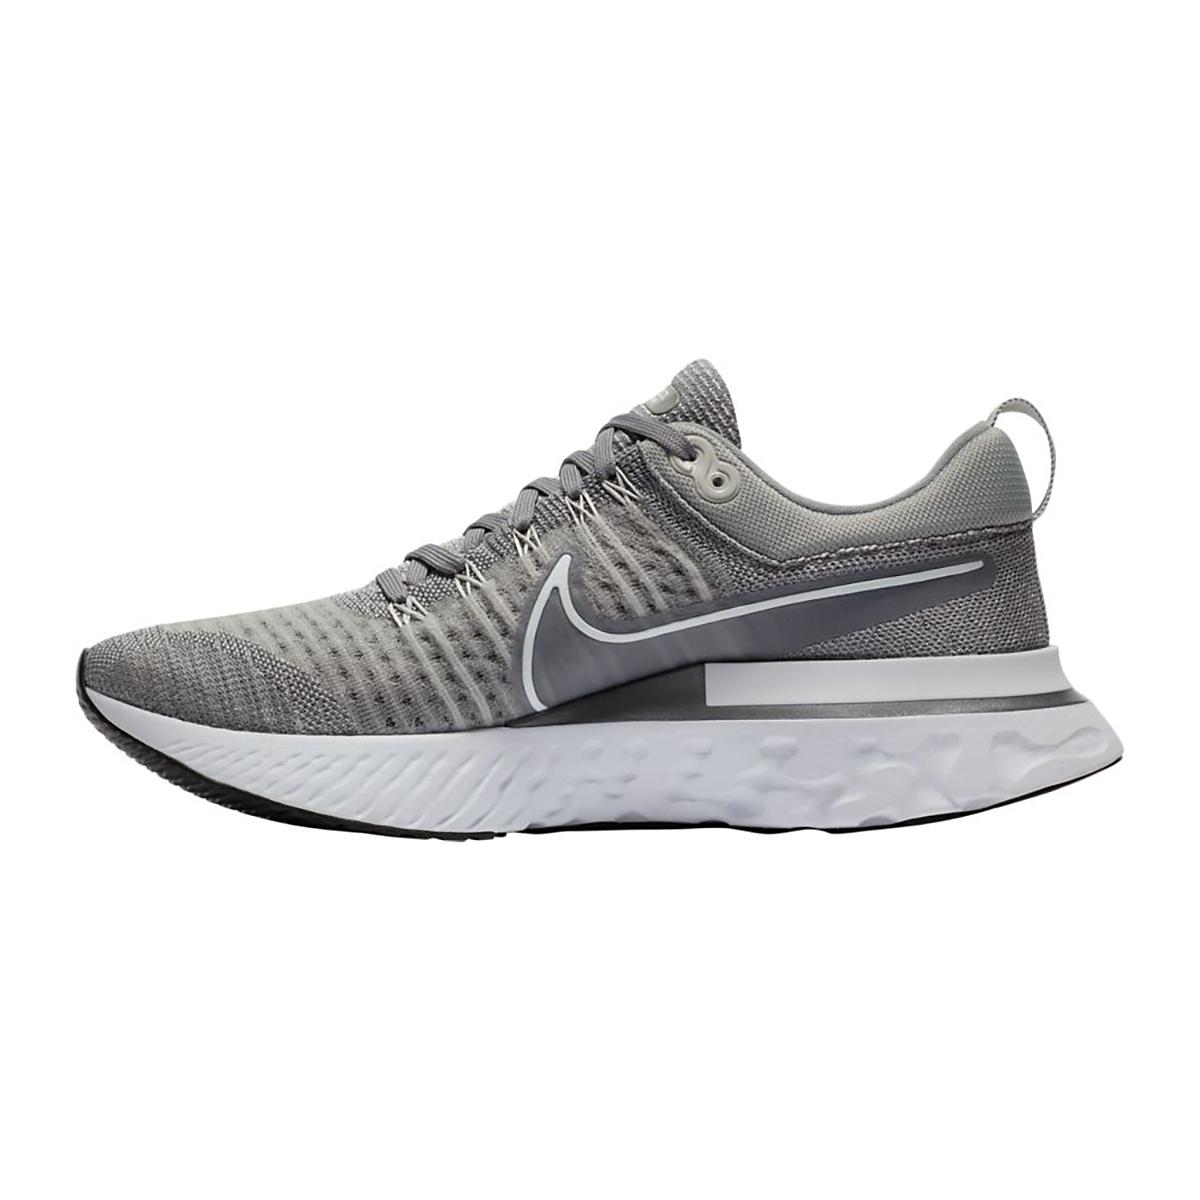 Men's Nike React Infinity Run Flyknit 2 Running Shoe - Color: Particle Grey/White/Grey Fog/Black - Size: 7.5 - Width: Regular, Particle Grey/White/Grey Fog/Black, large, image 2